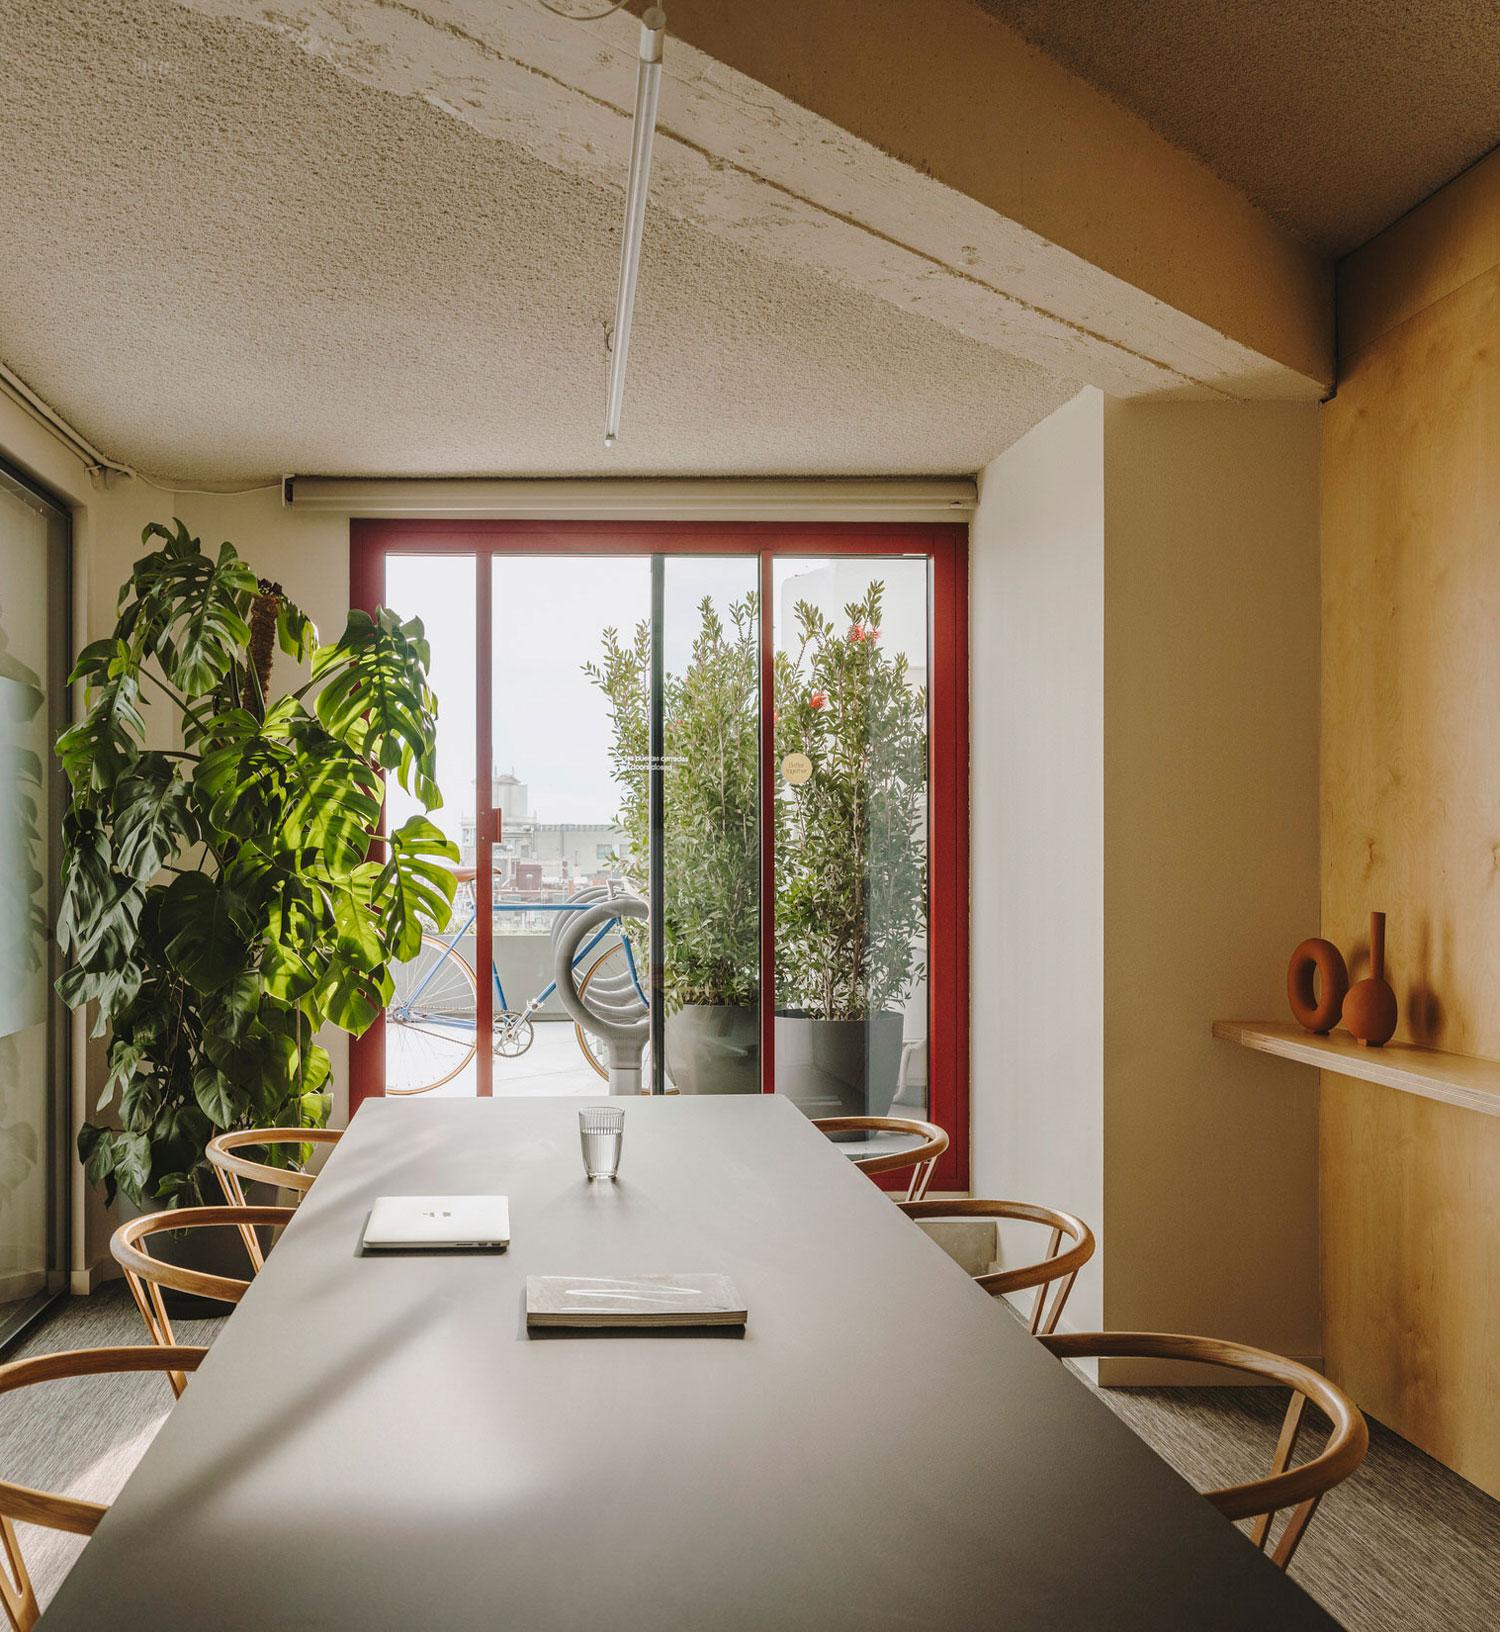 Mesura Architecture Design Cloudworks Penthouse Office Barcelona Photo Salva Lopez Yellowtrace 03a